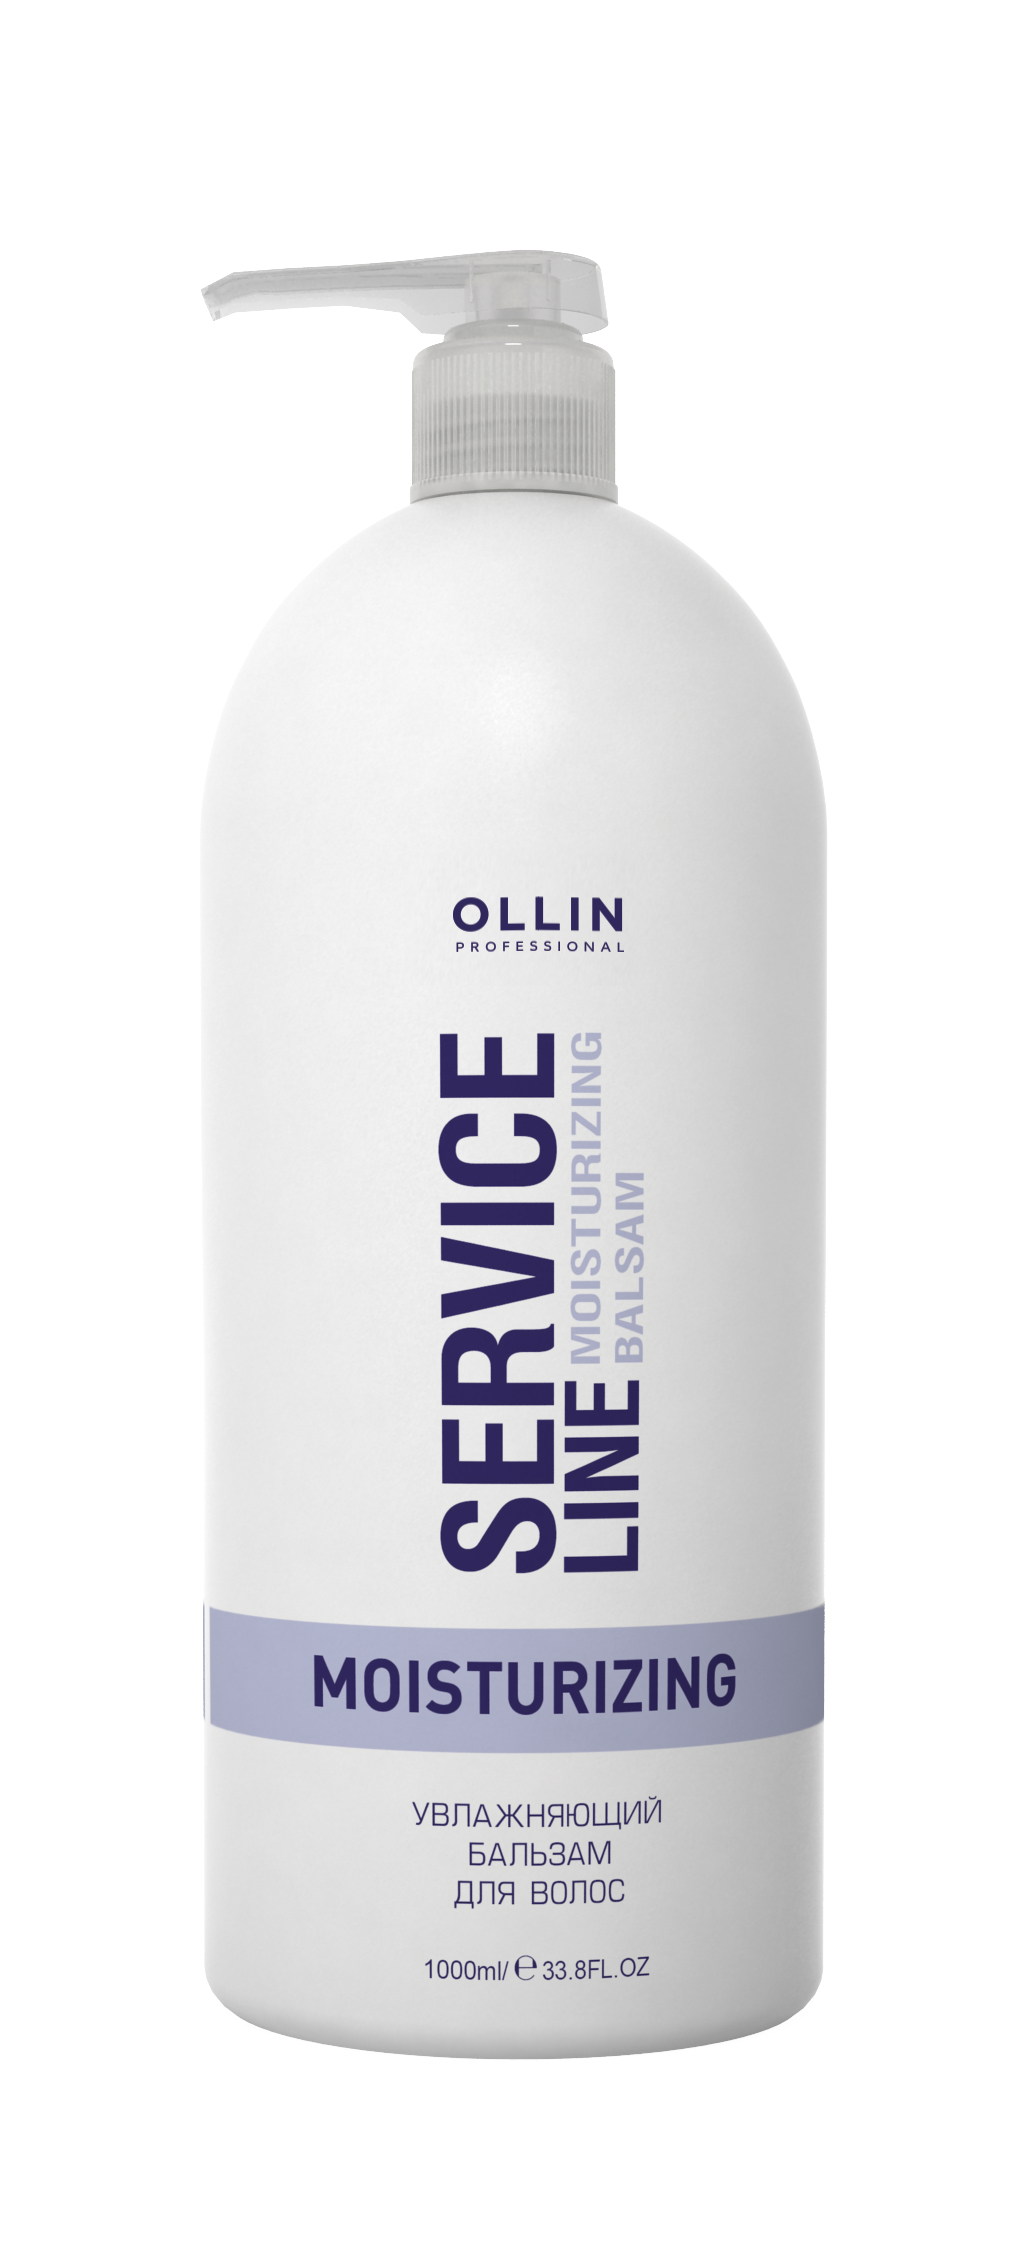 OLLIN PROFESSIONAL Бальзам увлажняющий для волос / Moisturizing balsam 1000мл